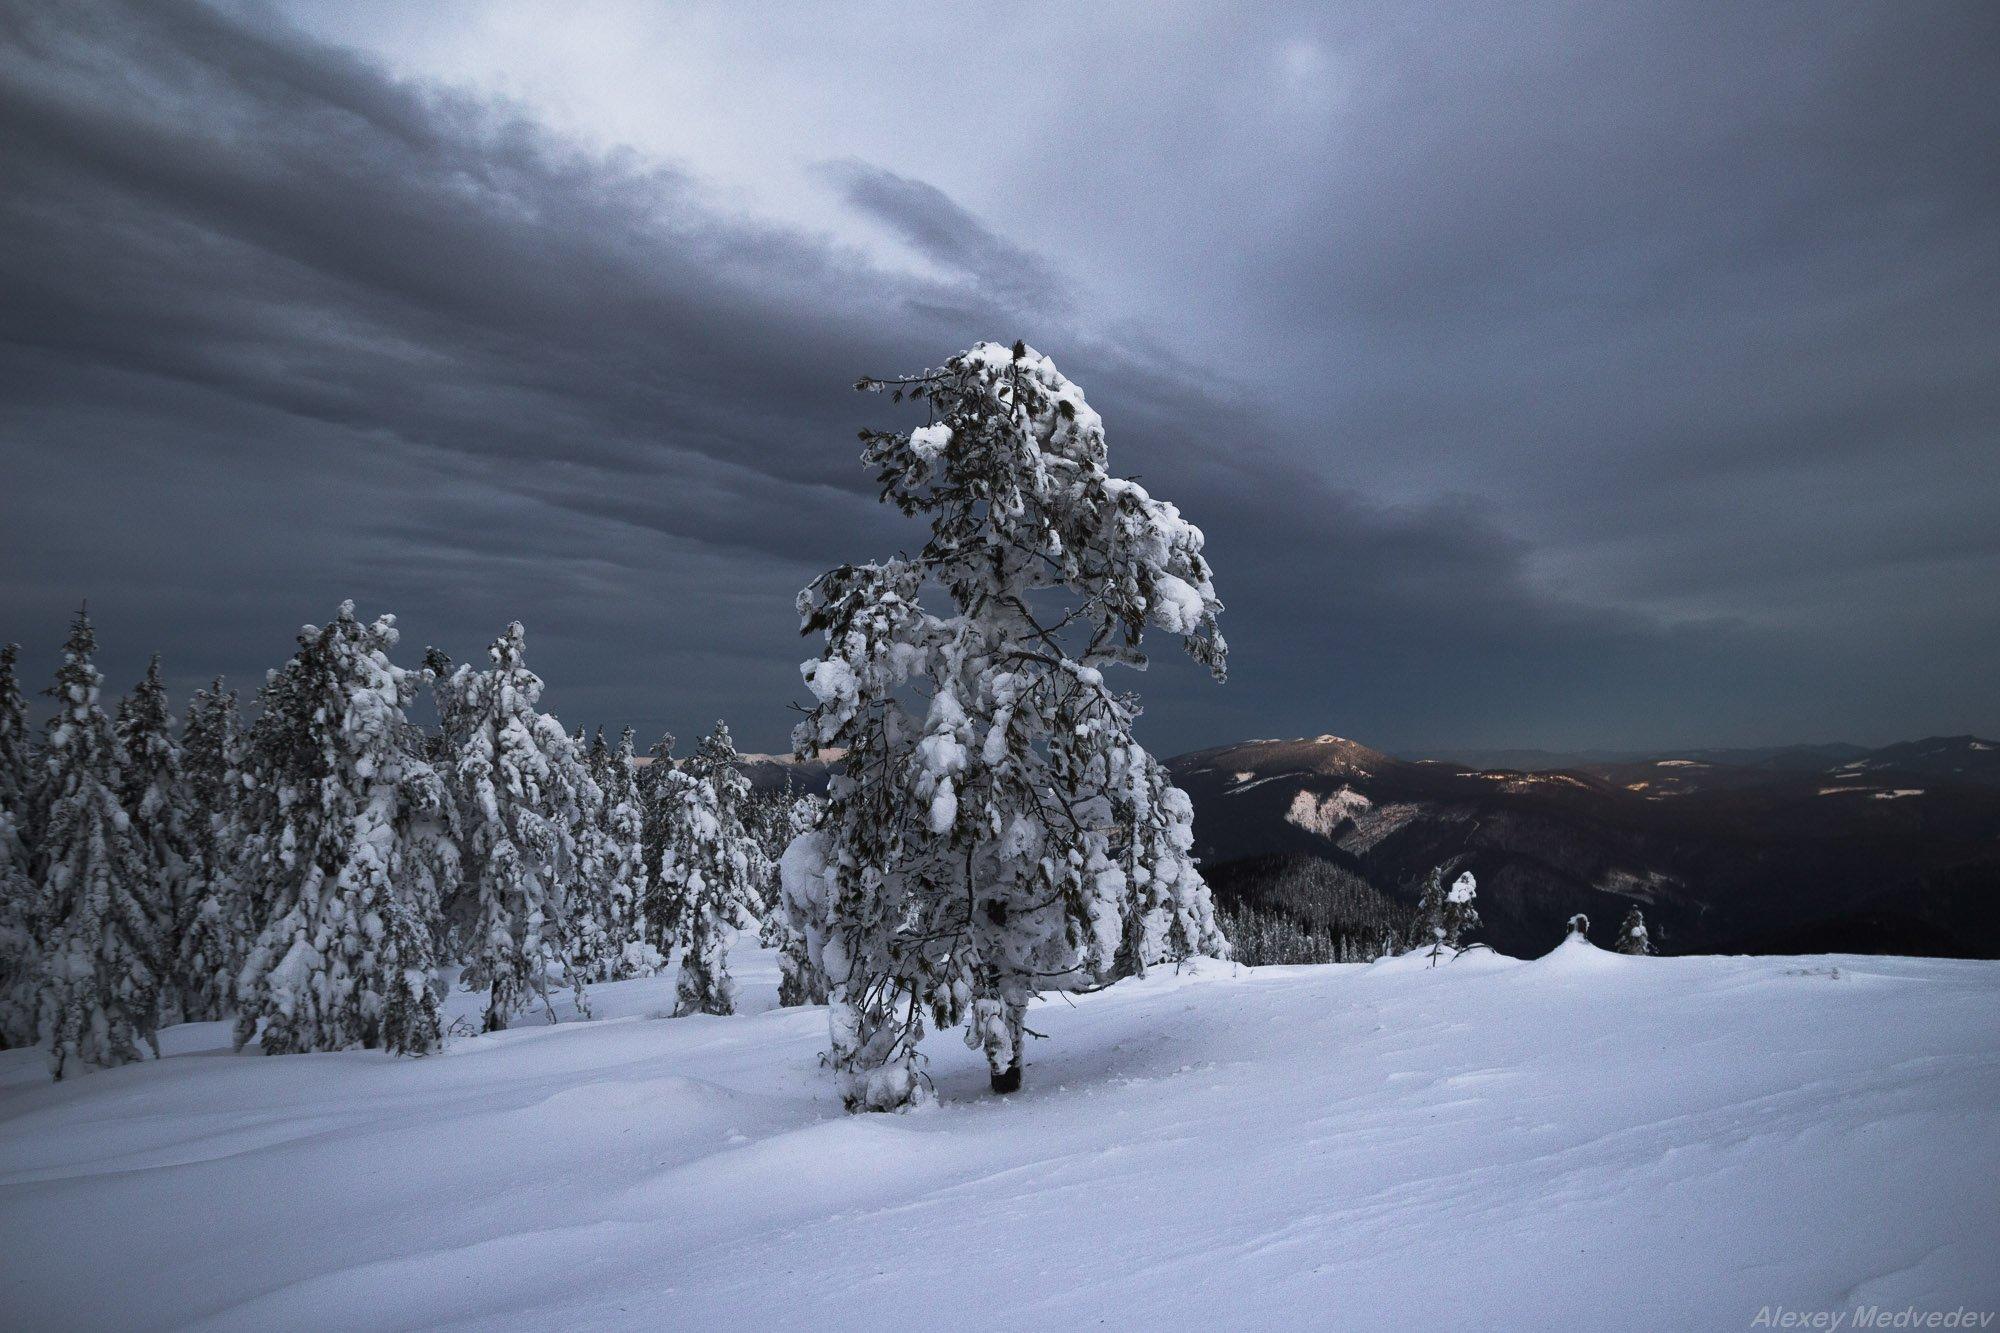 winter, white, frost, snow, carpathians, ukraine,  carpathians, alone, mountains, горы, зима, холод, Карпаты, горганы, Алексей Медведев